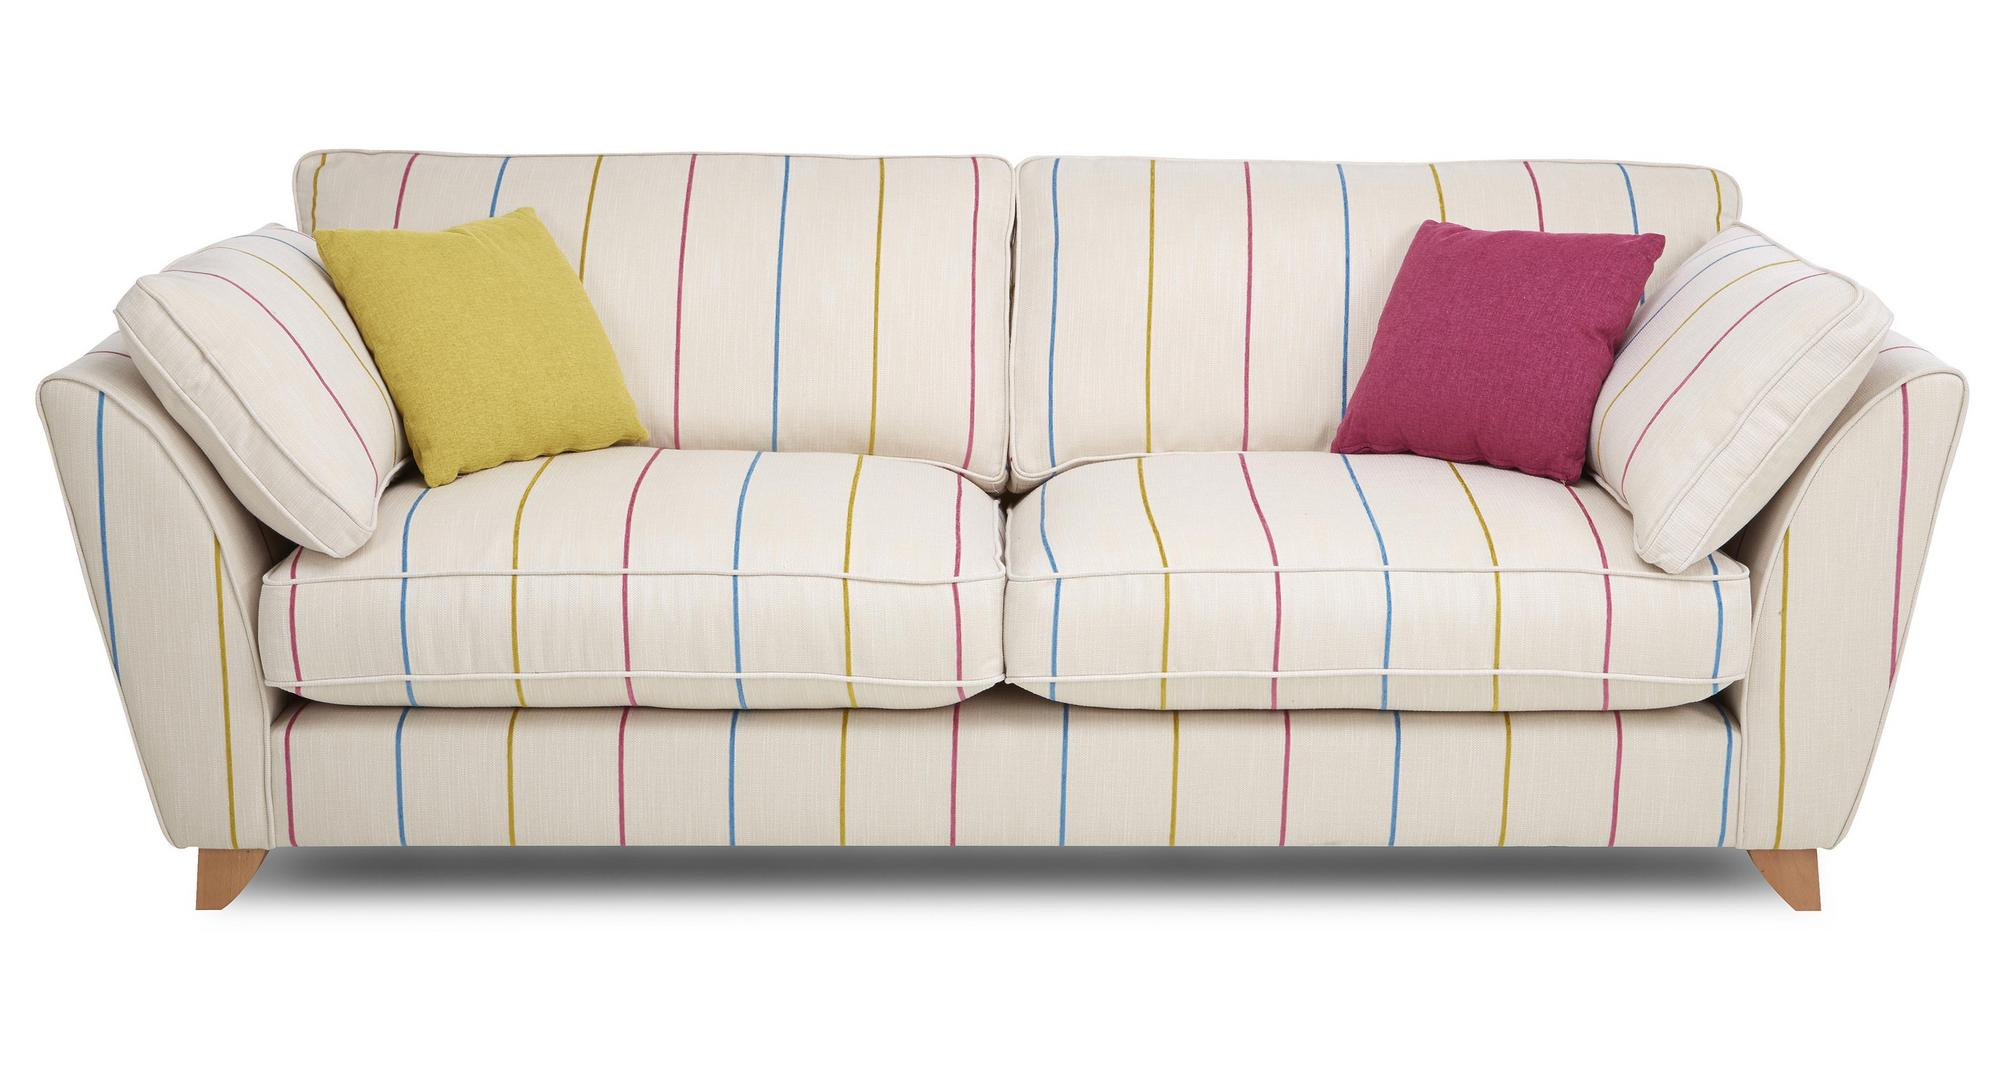 striped fabric sofas uk mayo sofa reviews dfs bude tutti frutti stripe 4 seater 78103